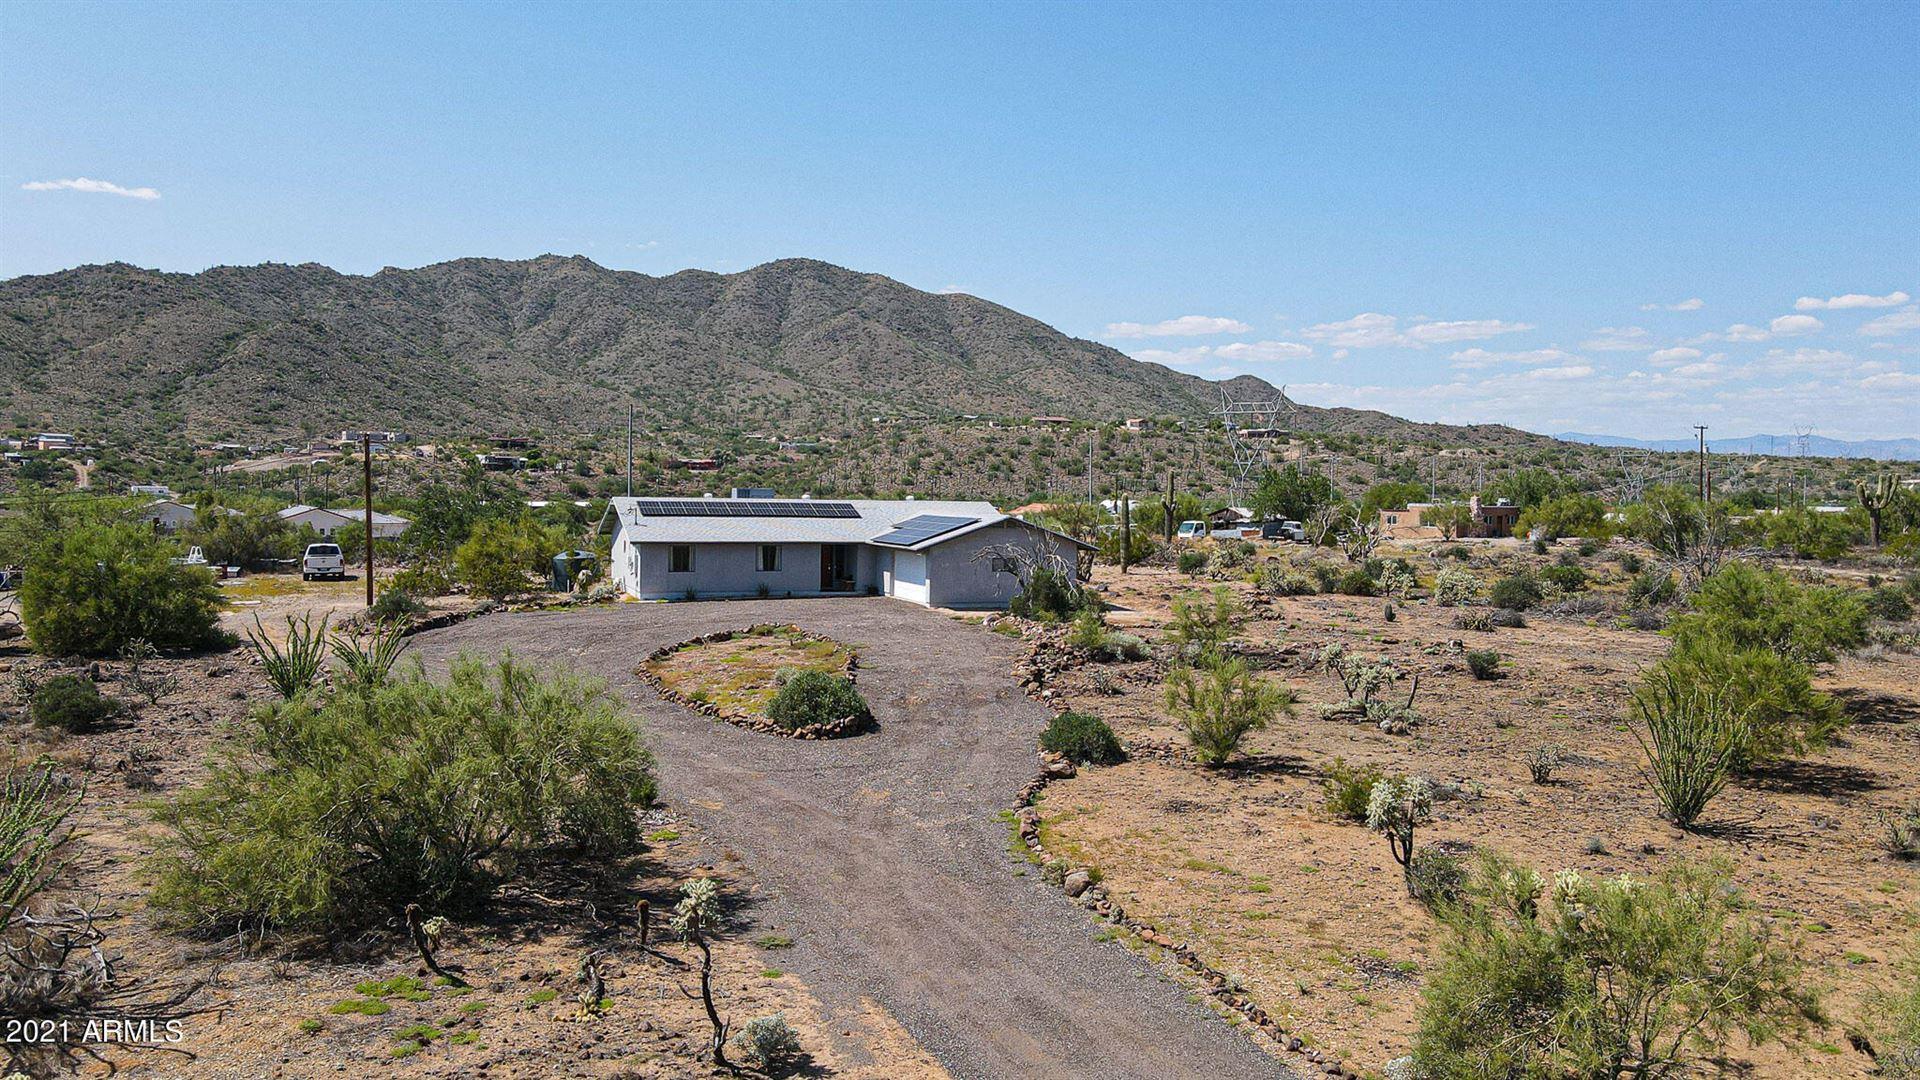 Photo of 43226 N 3rd Avenue, New River, AZ 85087 (MLS # 6291424)